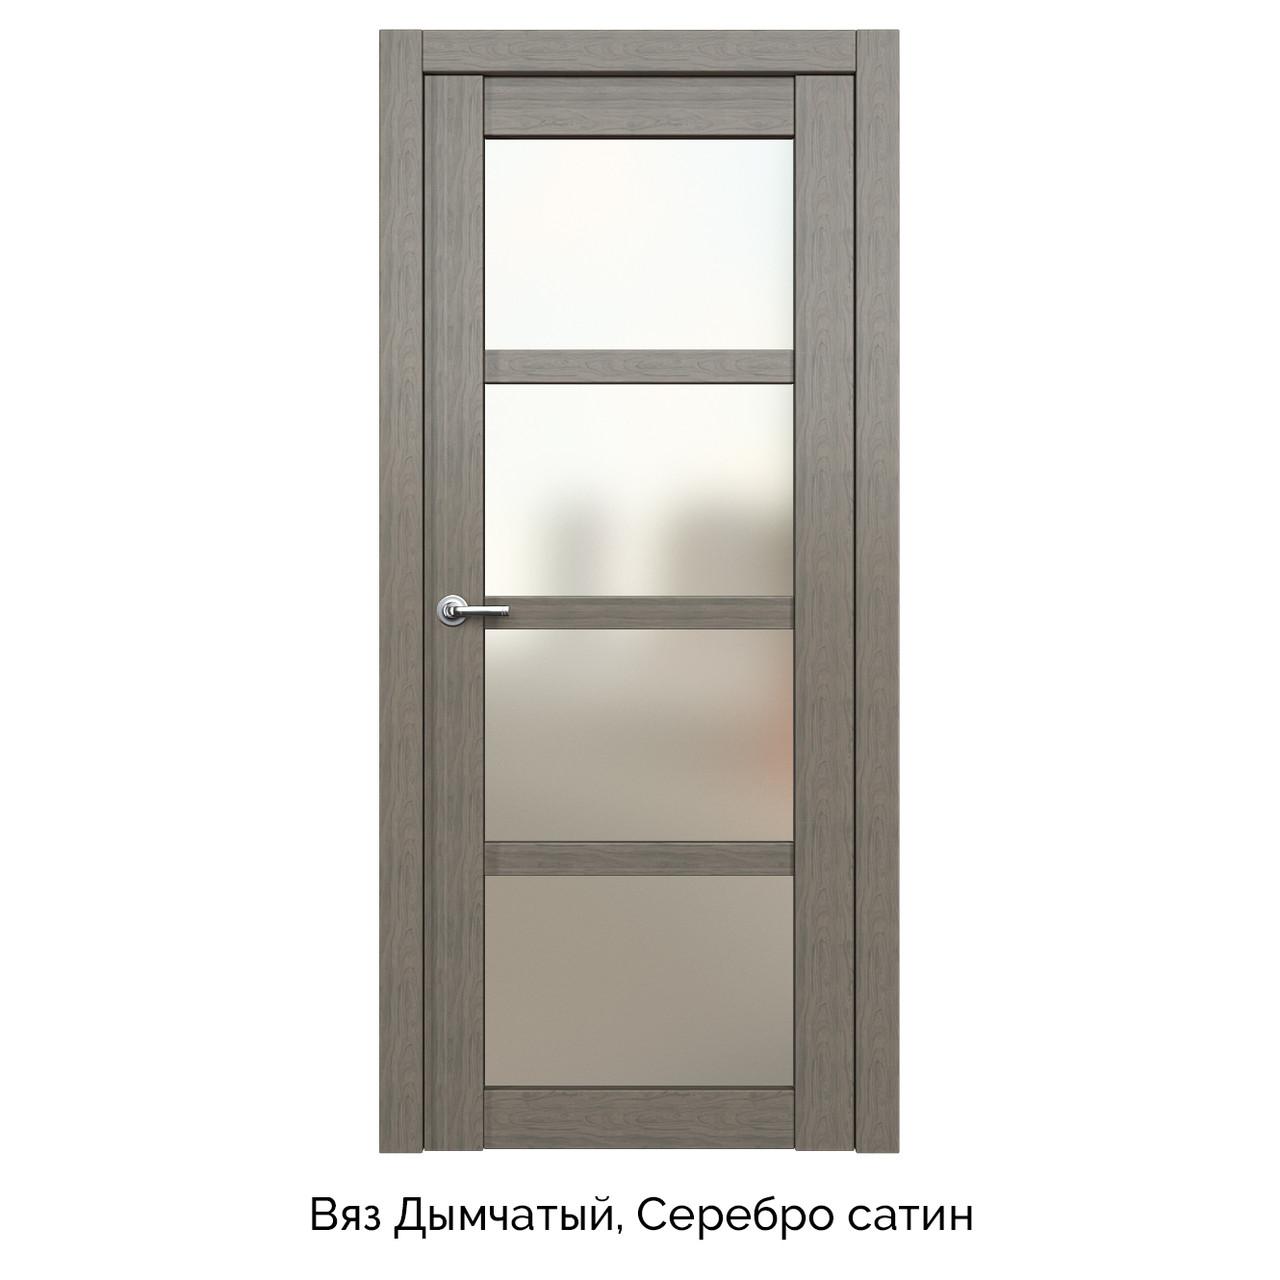 "Дверь межкомнатная ""Vegas 2"" - фото 4"